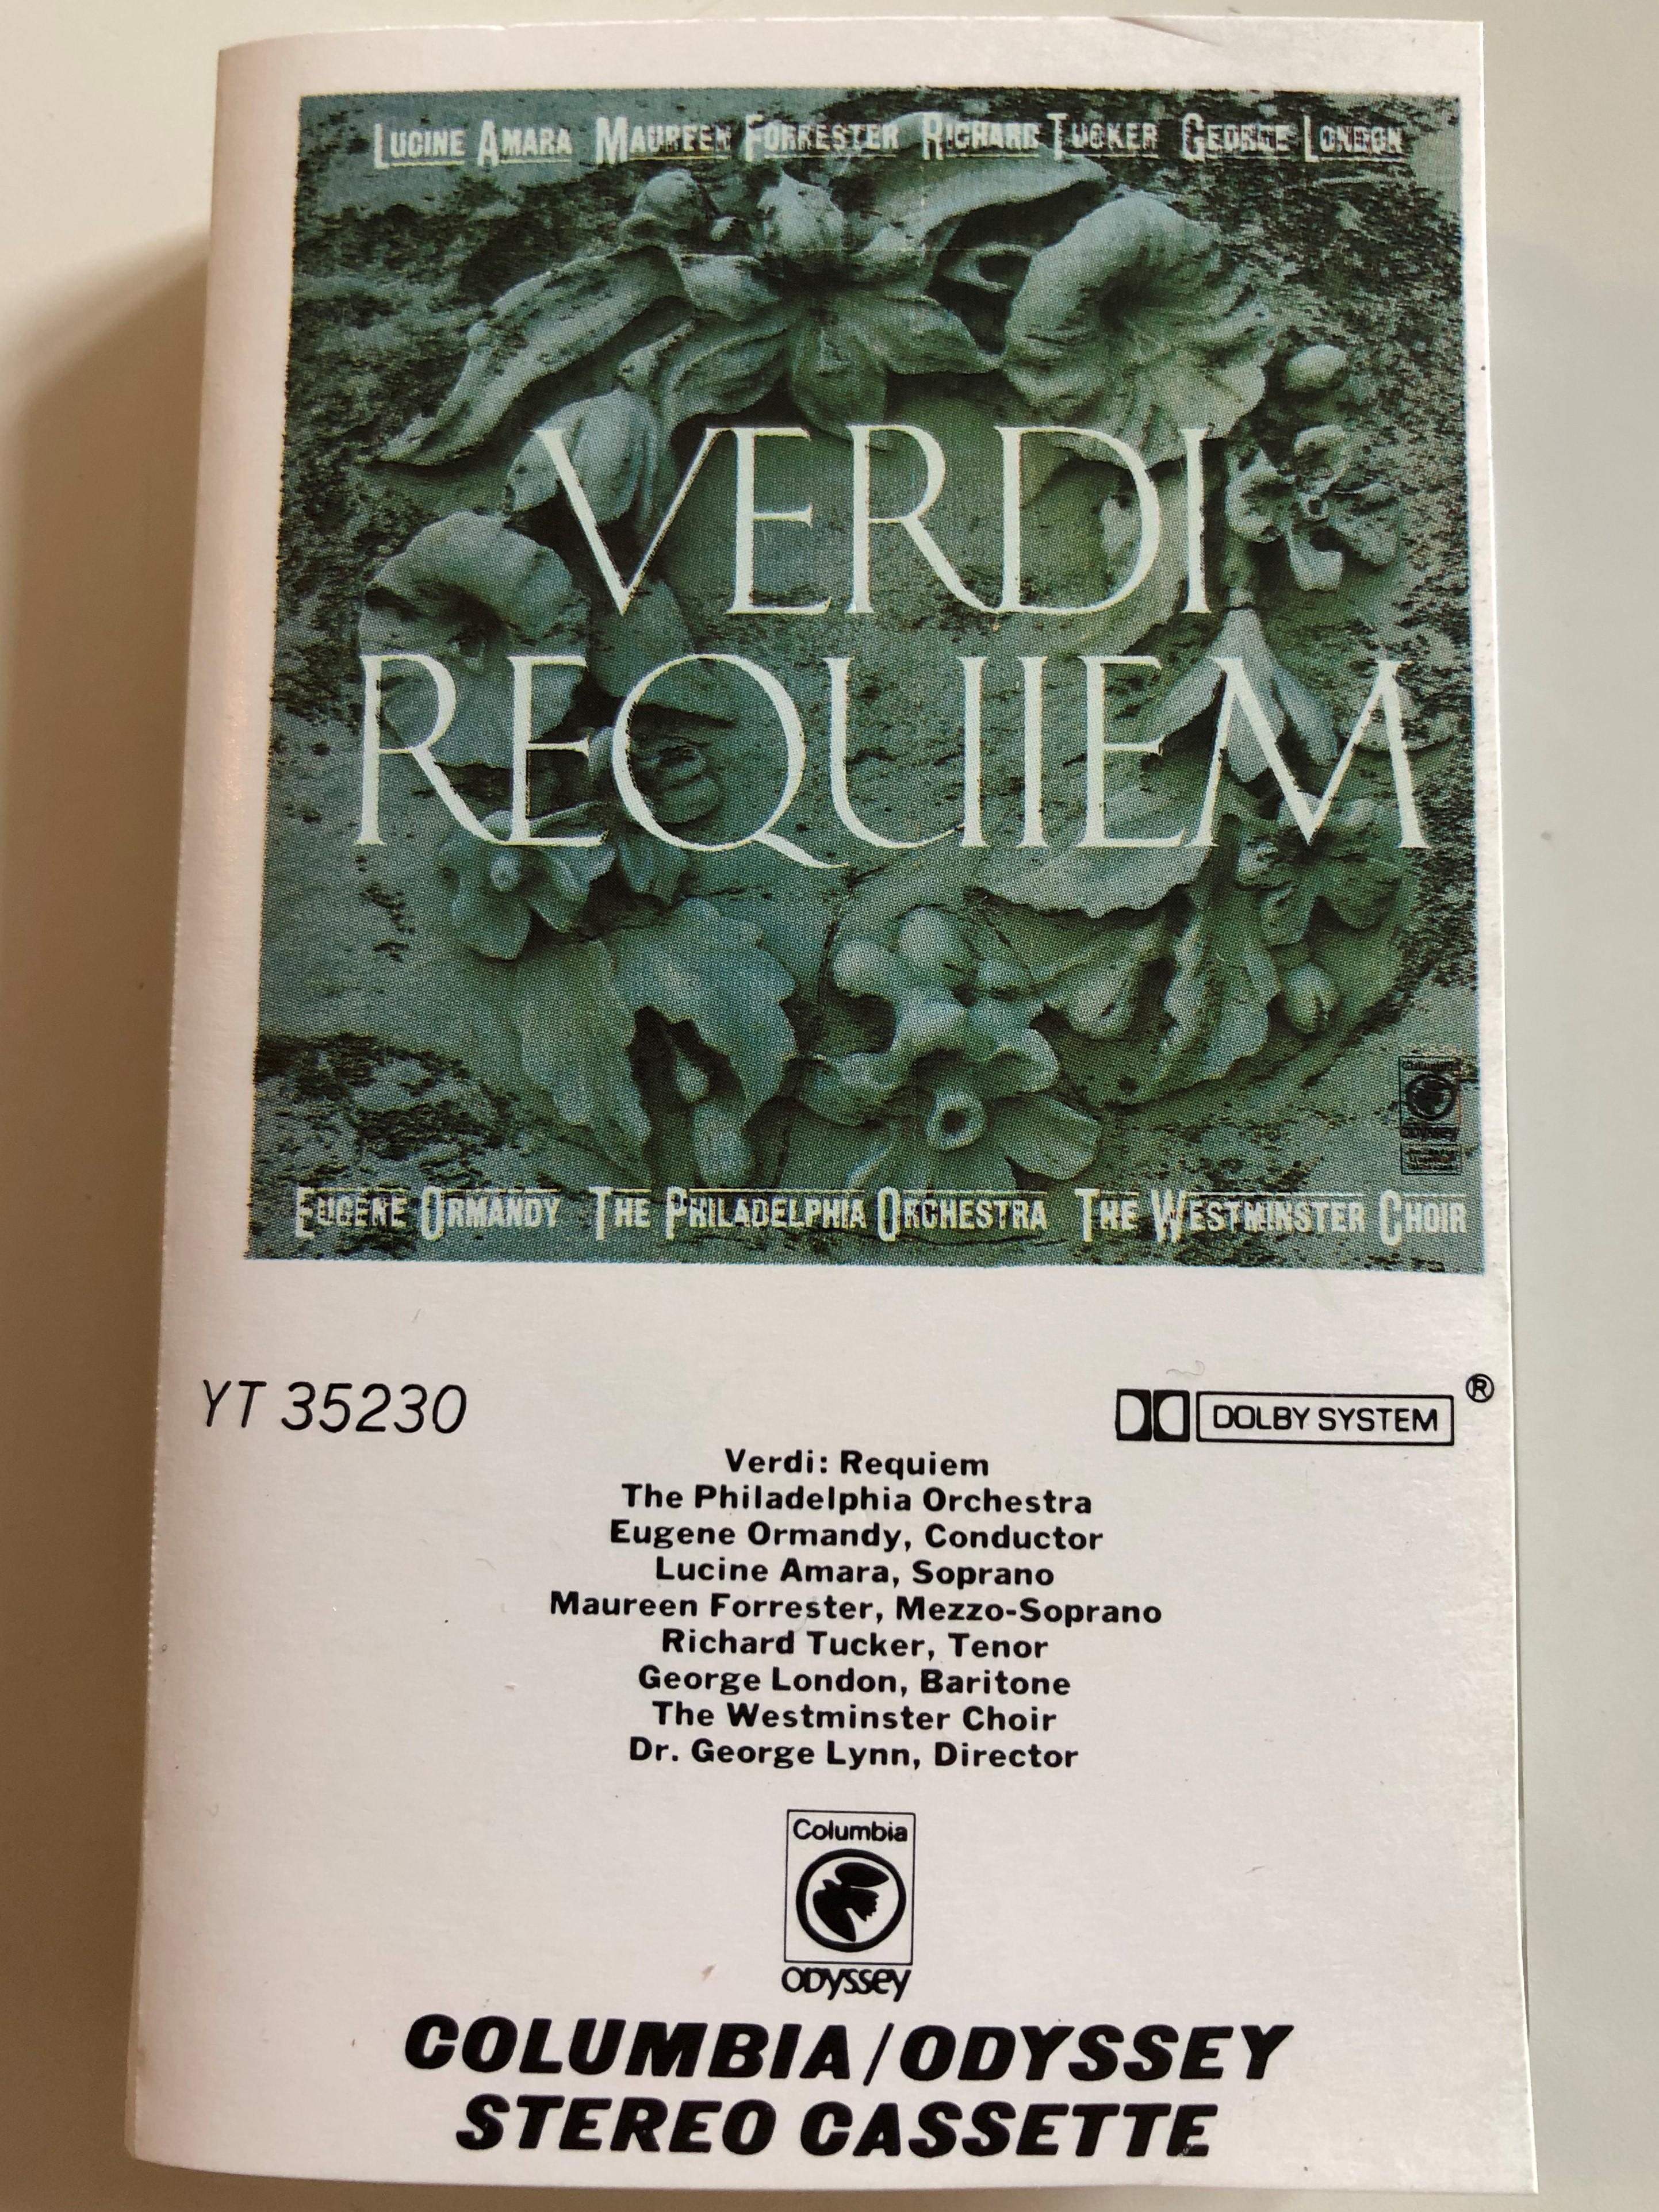 verdi-requiem-the-philadelphia-orchestra-conducted-eugene-ormandy-the-westminster-choir-odyssey-cassette-stereo-yt-35230-1-.jpg